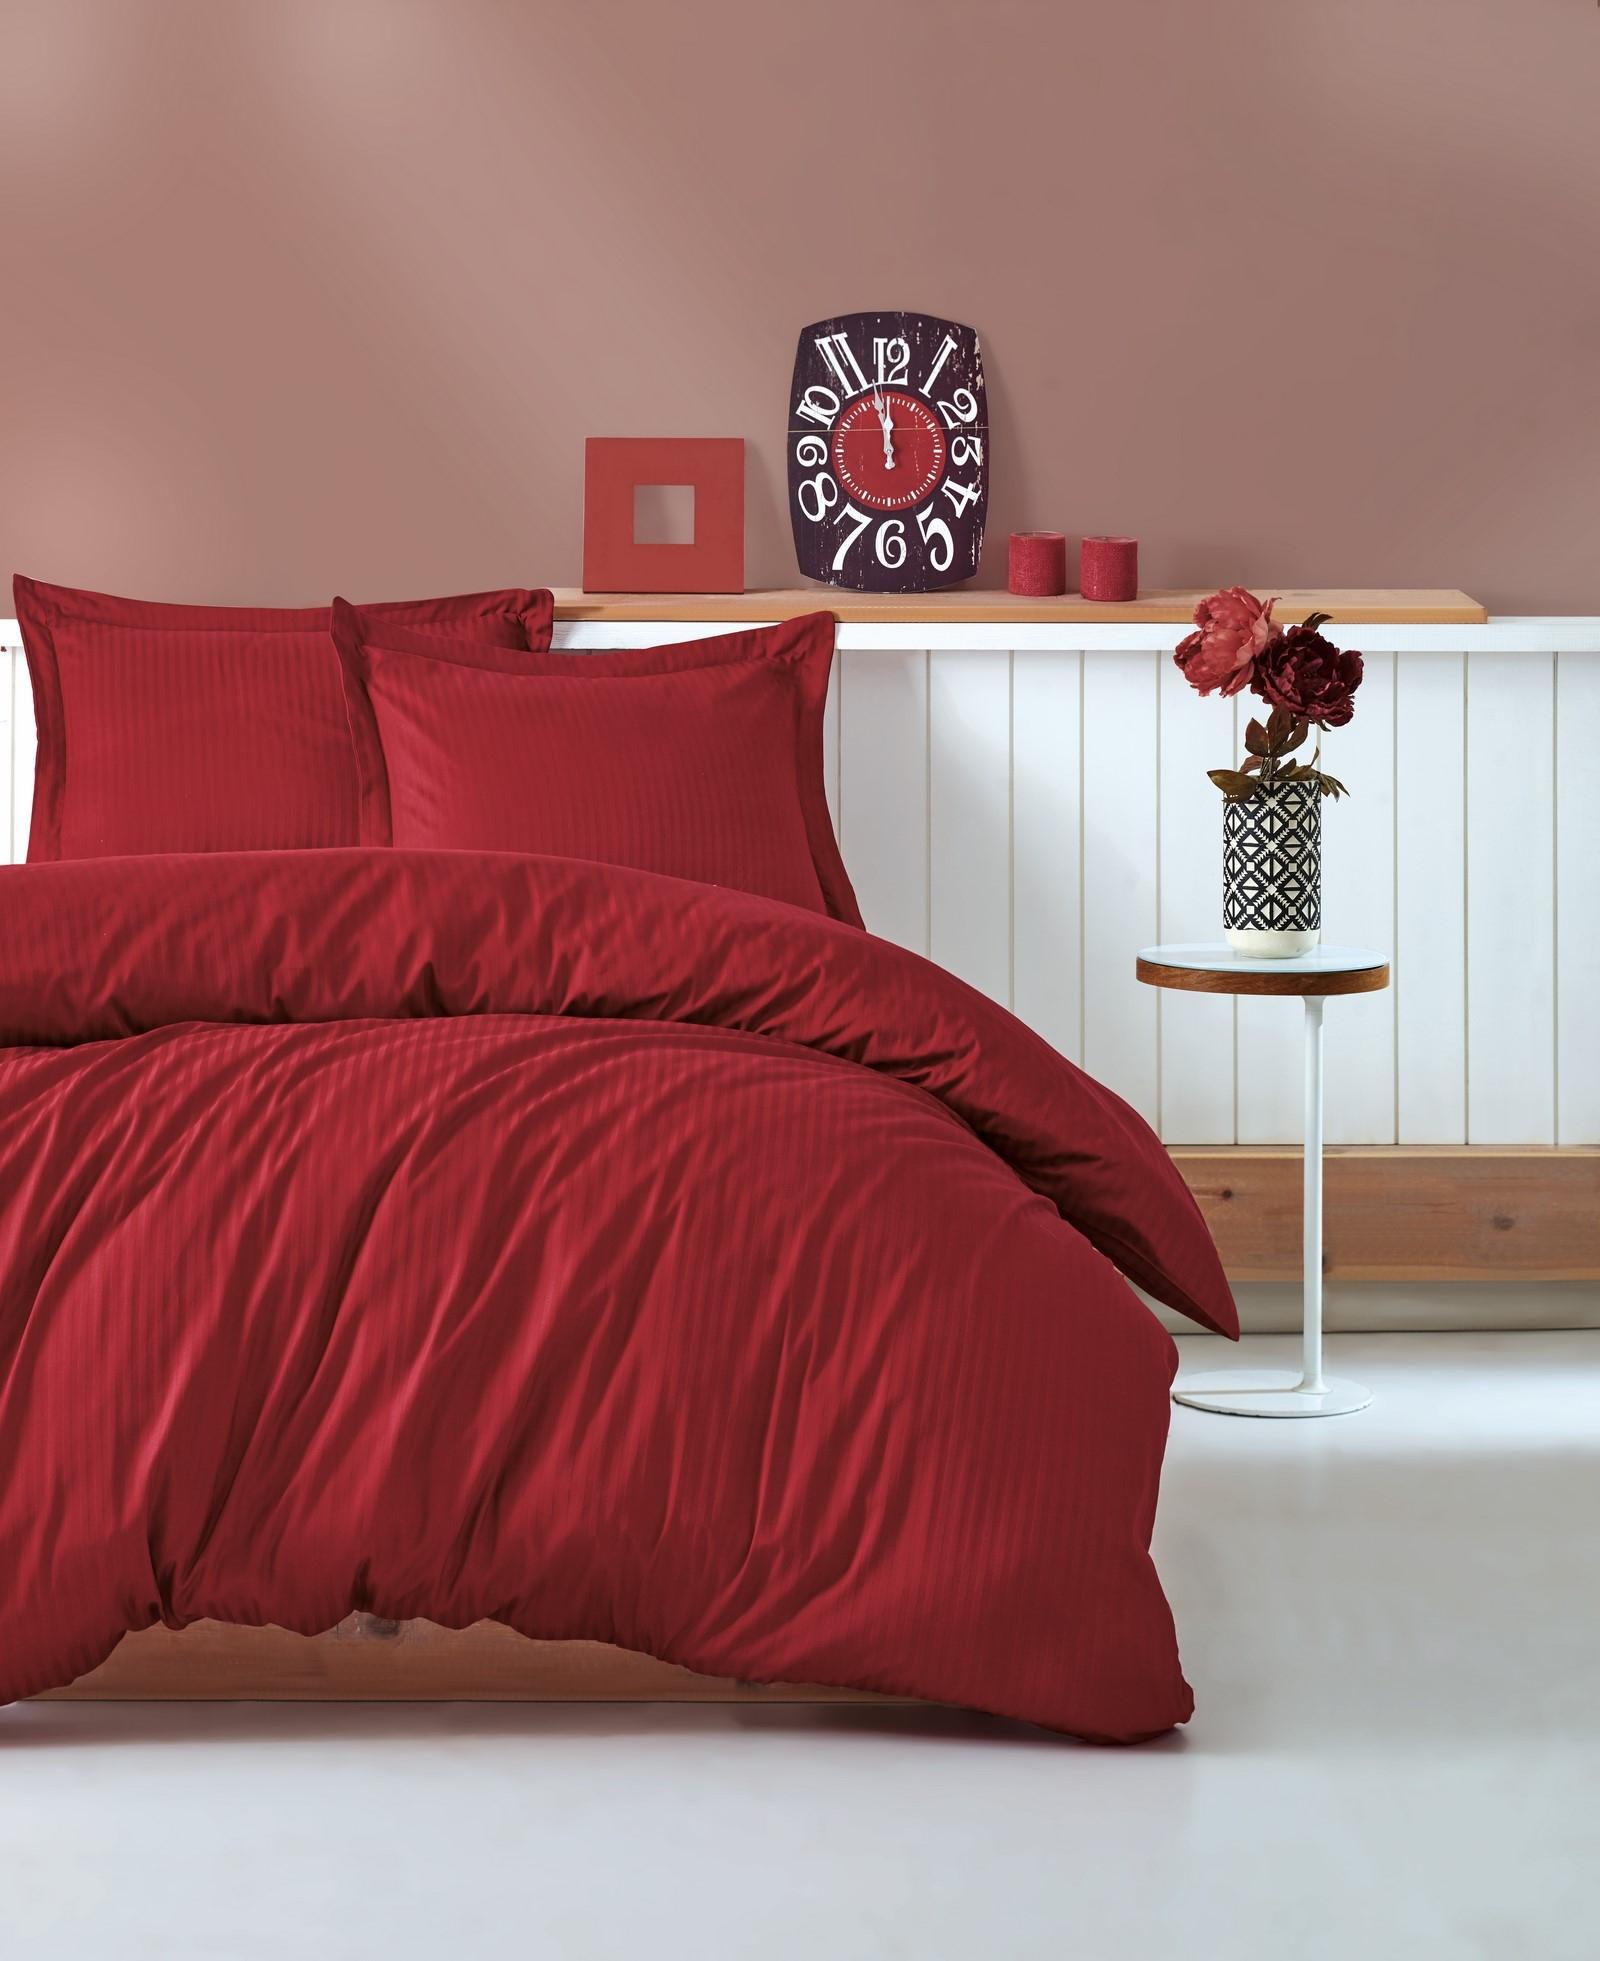 Lenjerie de pat din bumbac Satinat Premium Stripe Rosu Inchis, 200 x 220 cm imagine